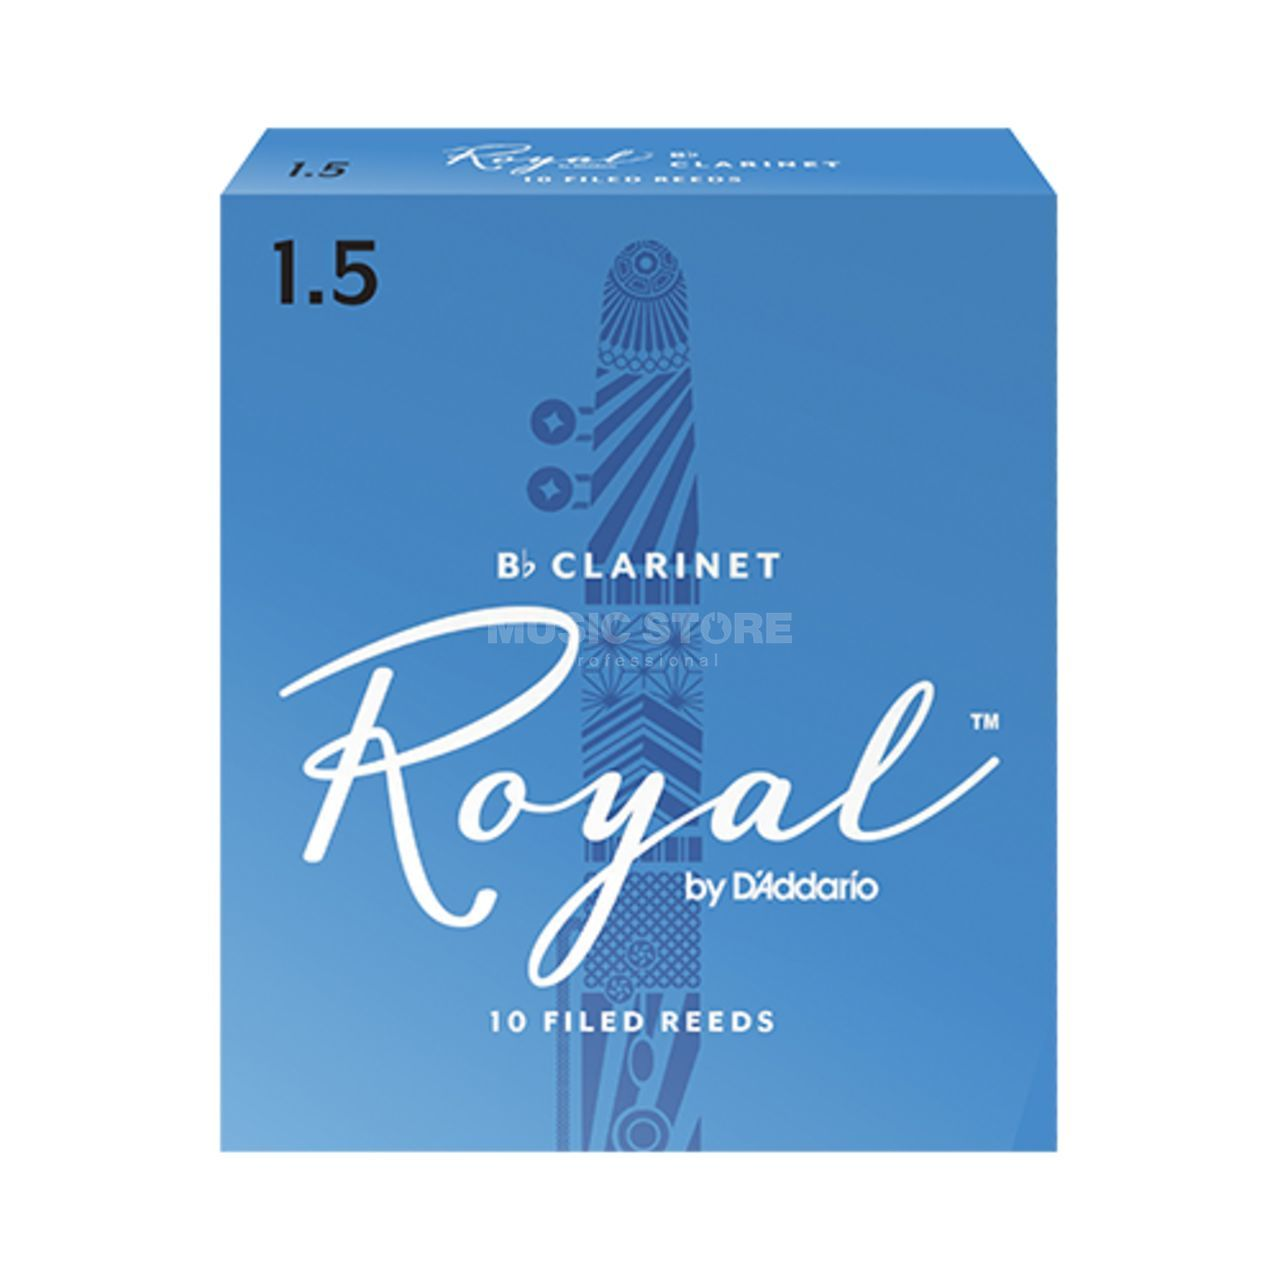 Rico Royal Bb Clarinet Reeds Strength 2.5 10-pack